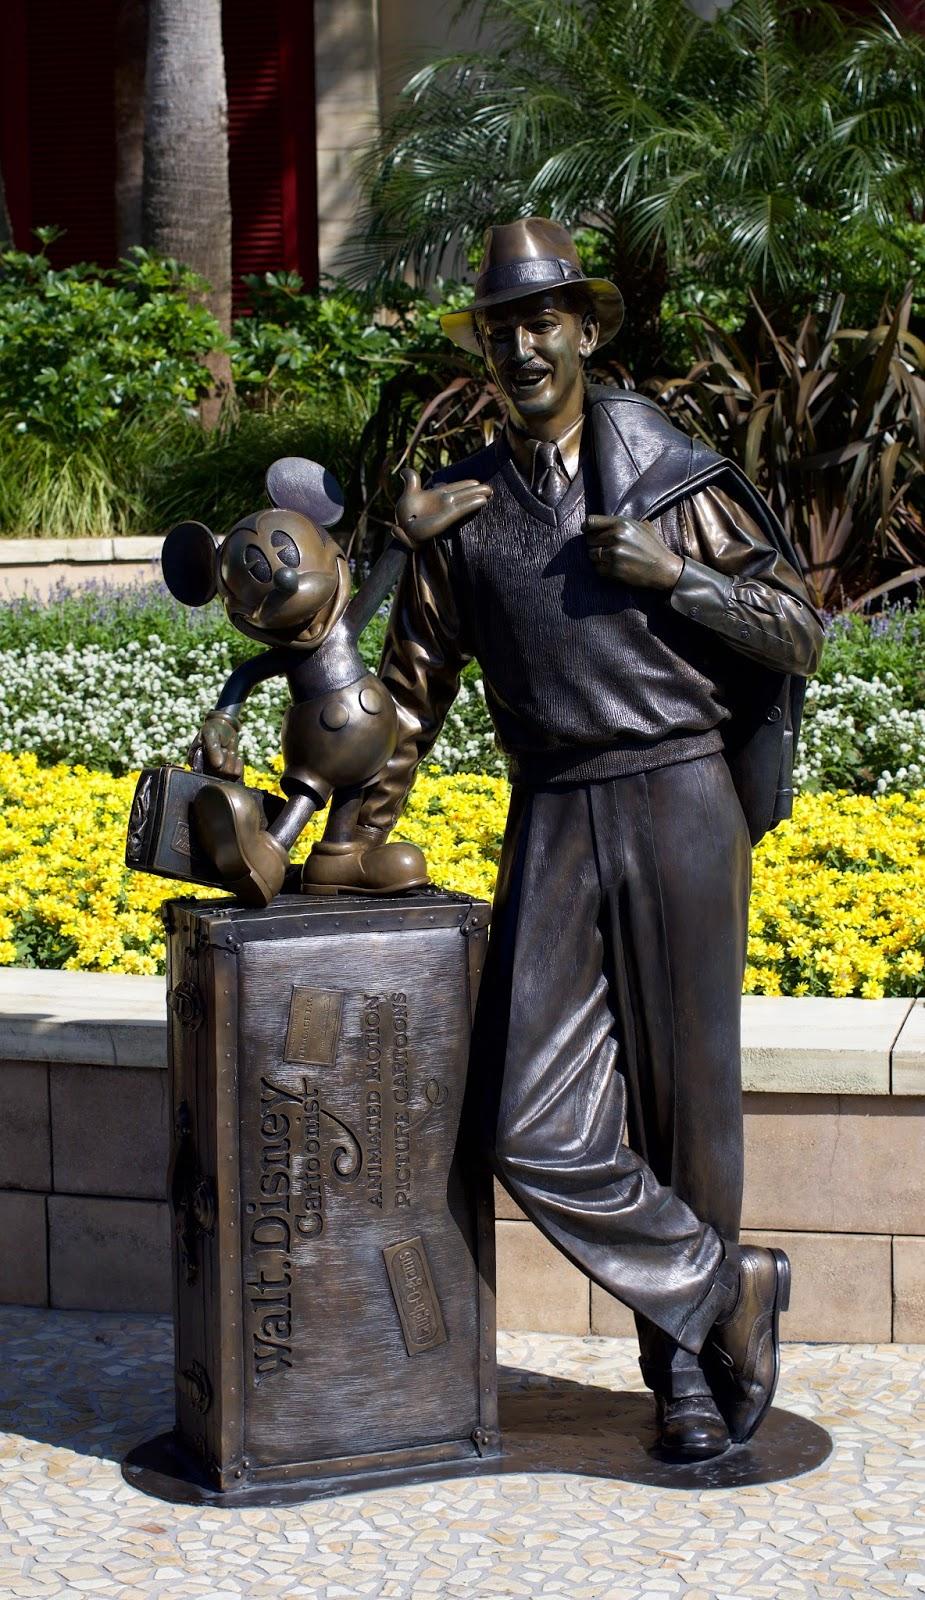 Tokyo-Disney-Sea-Walt-Disney-Mickey-Mouse-statue